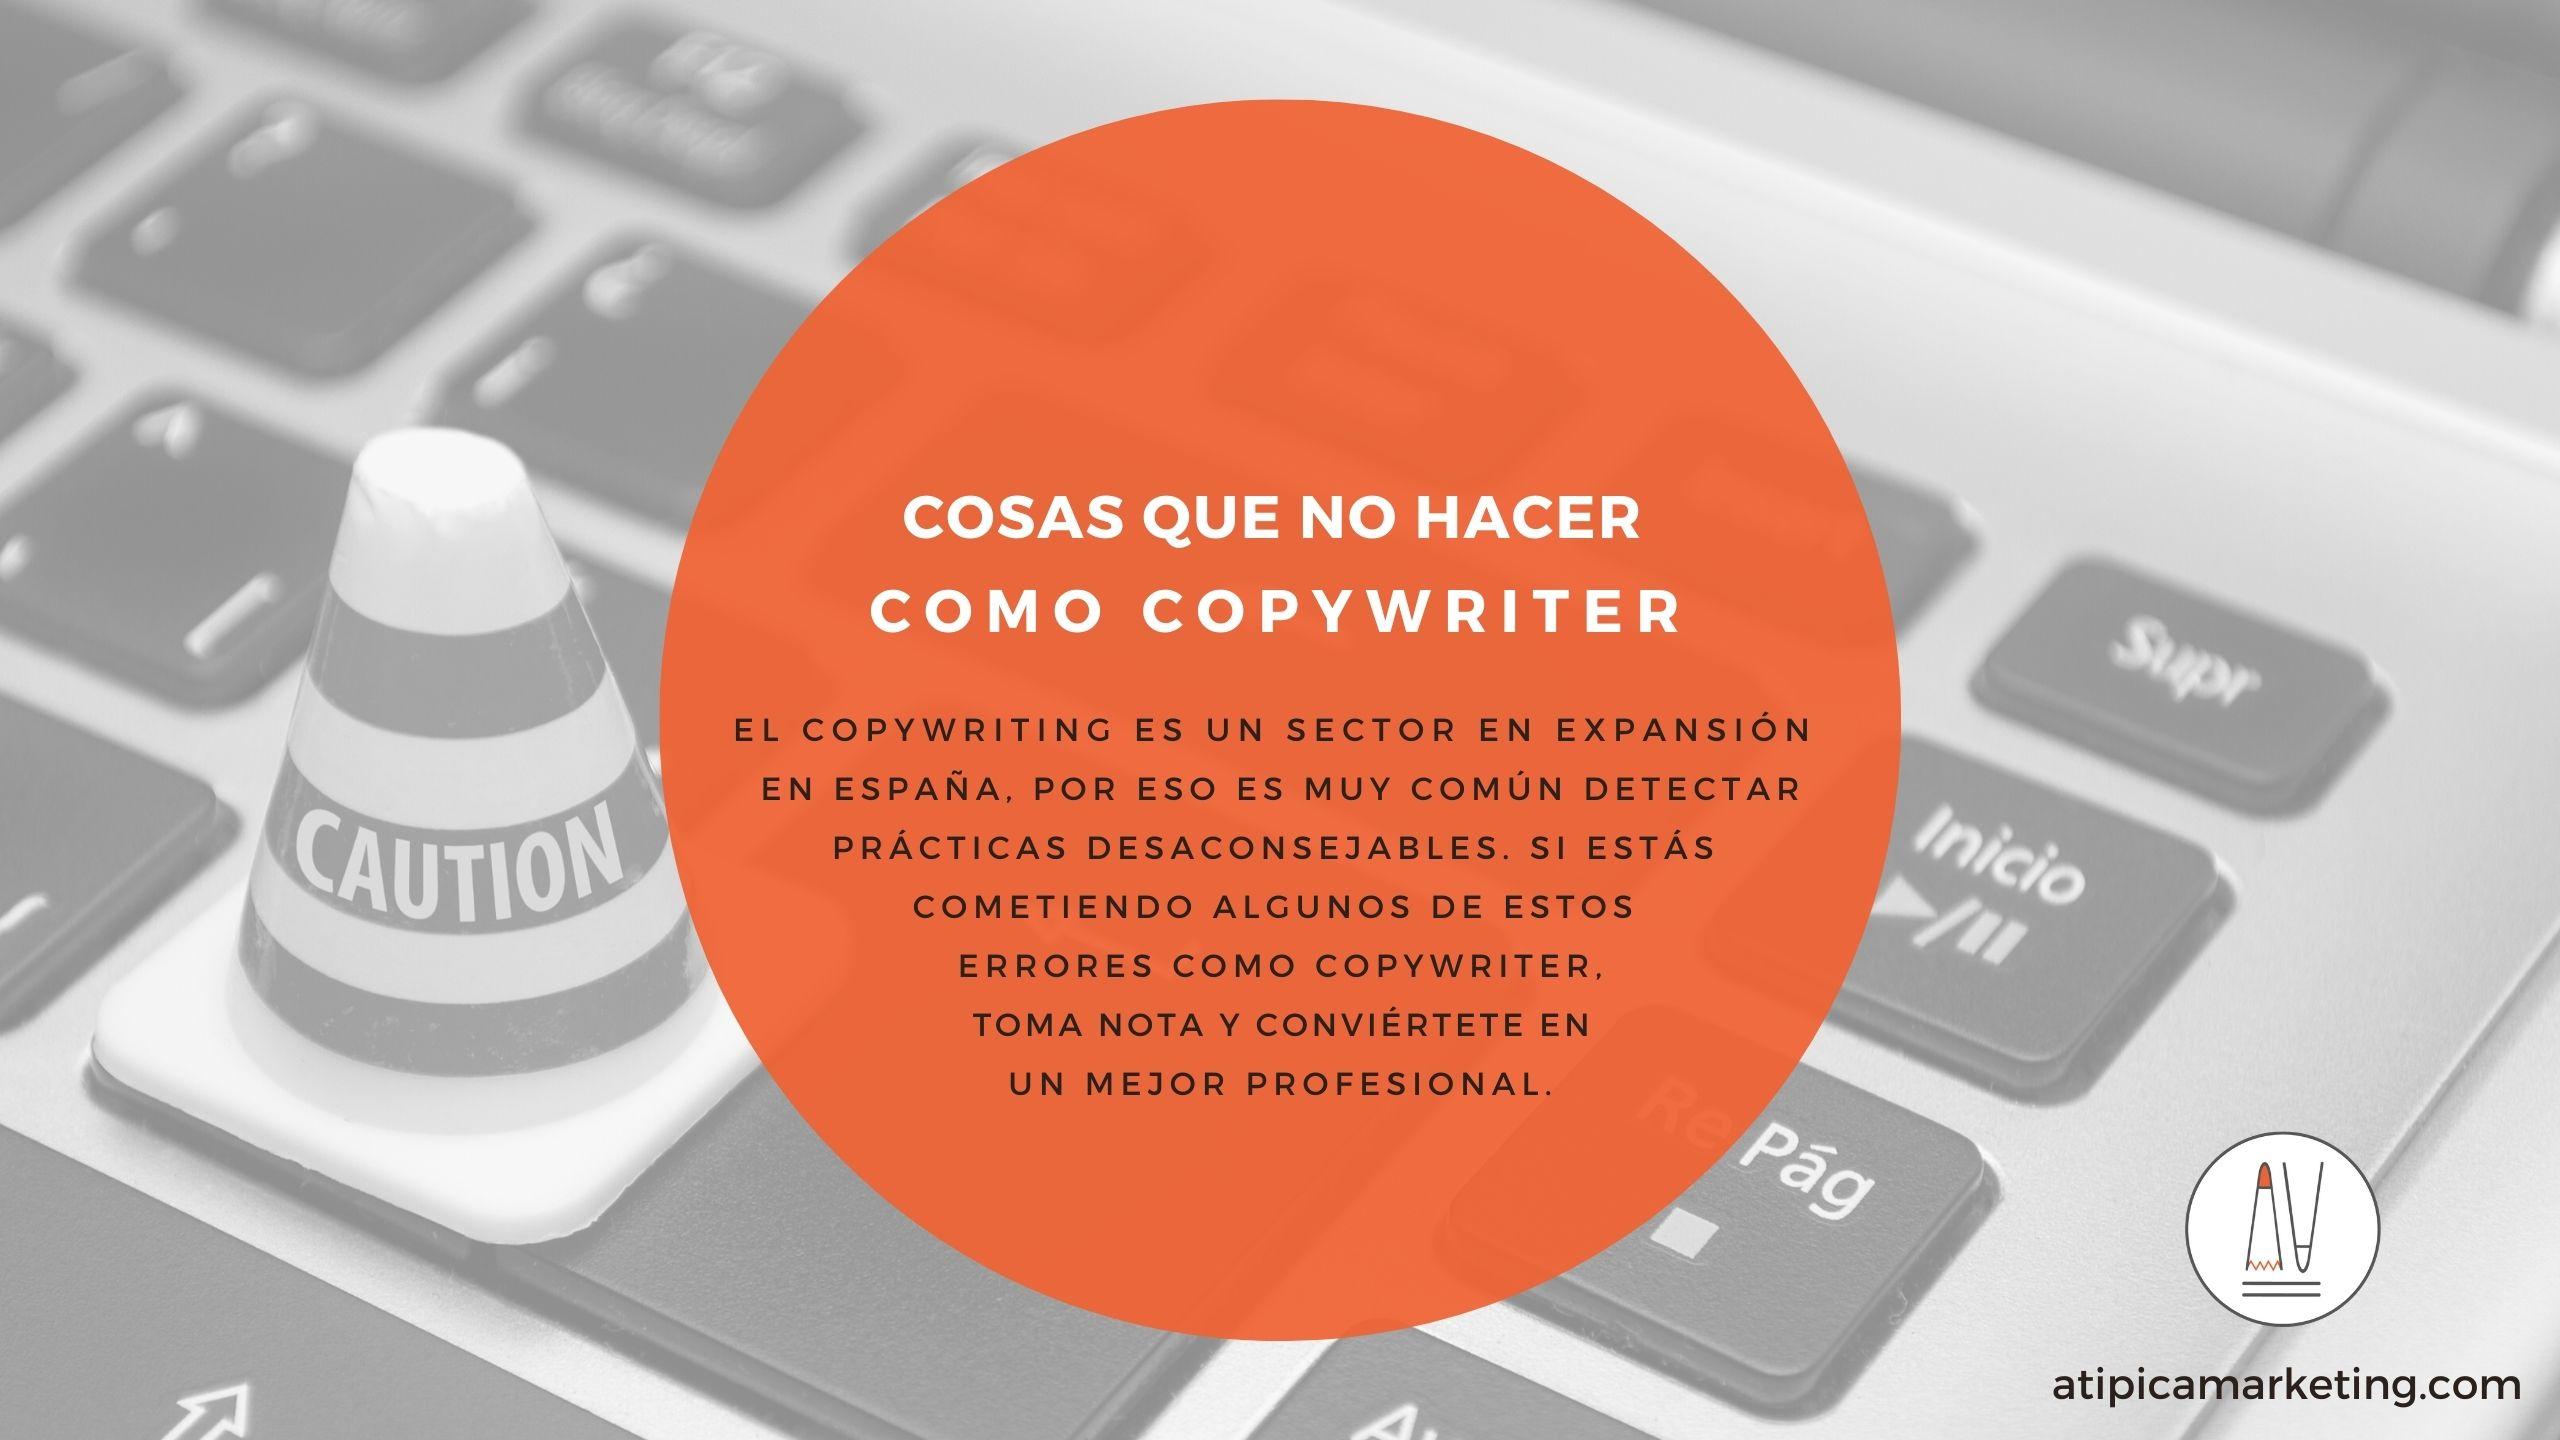 Cosas que no hacer como copywriter